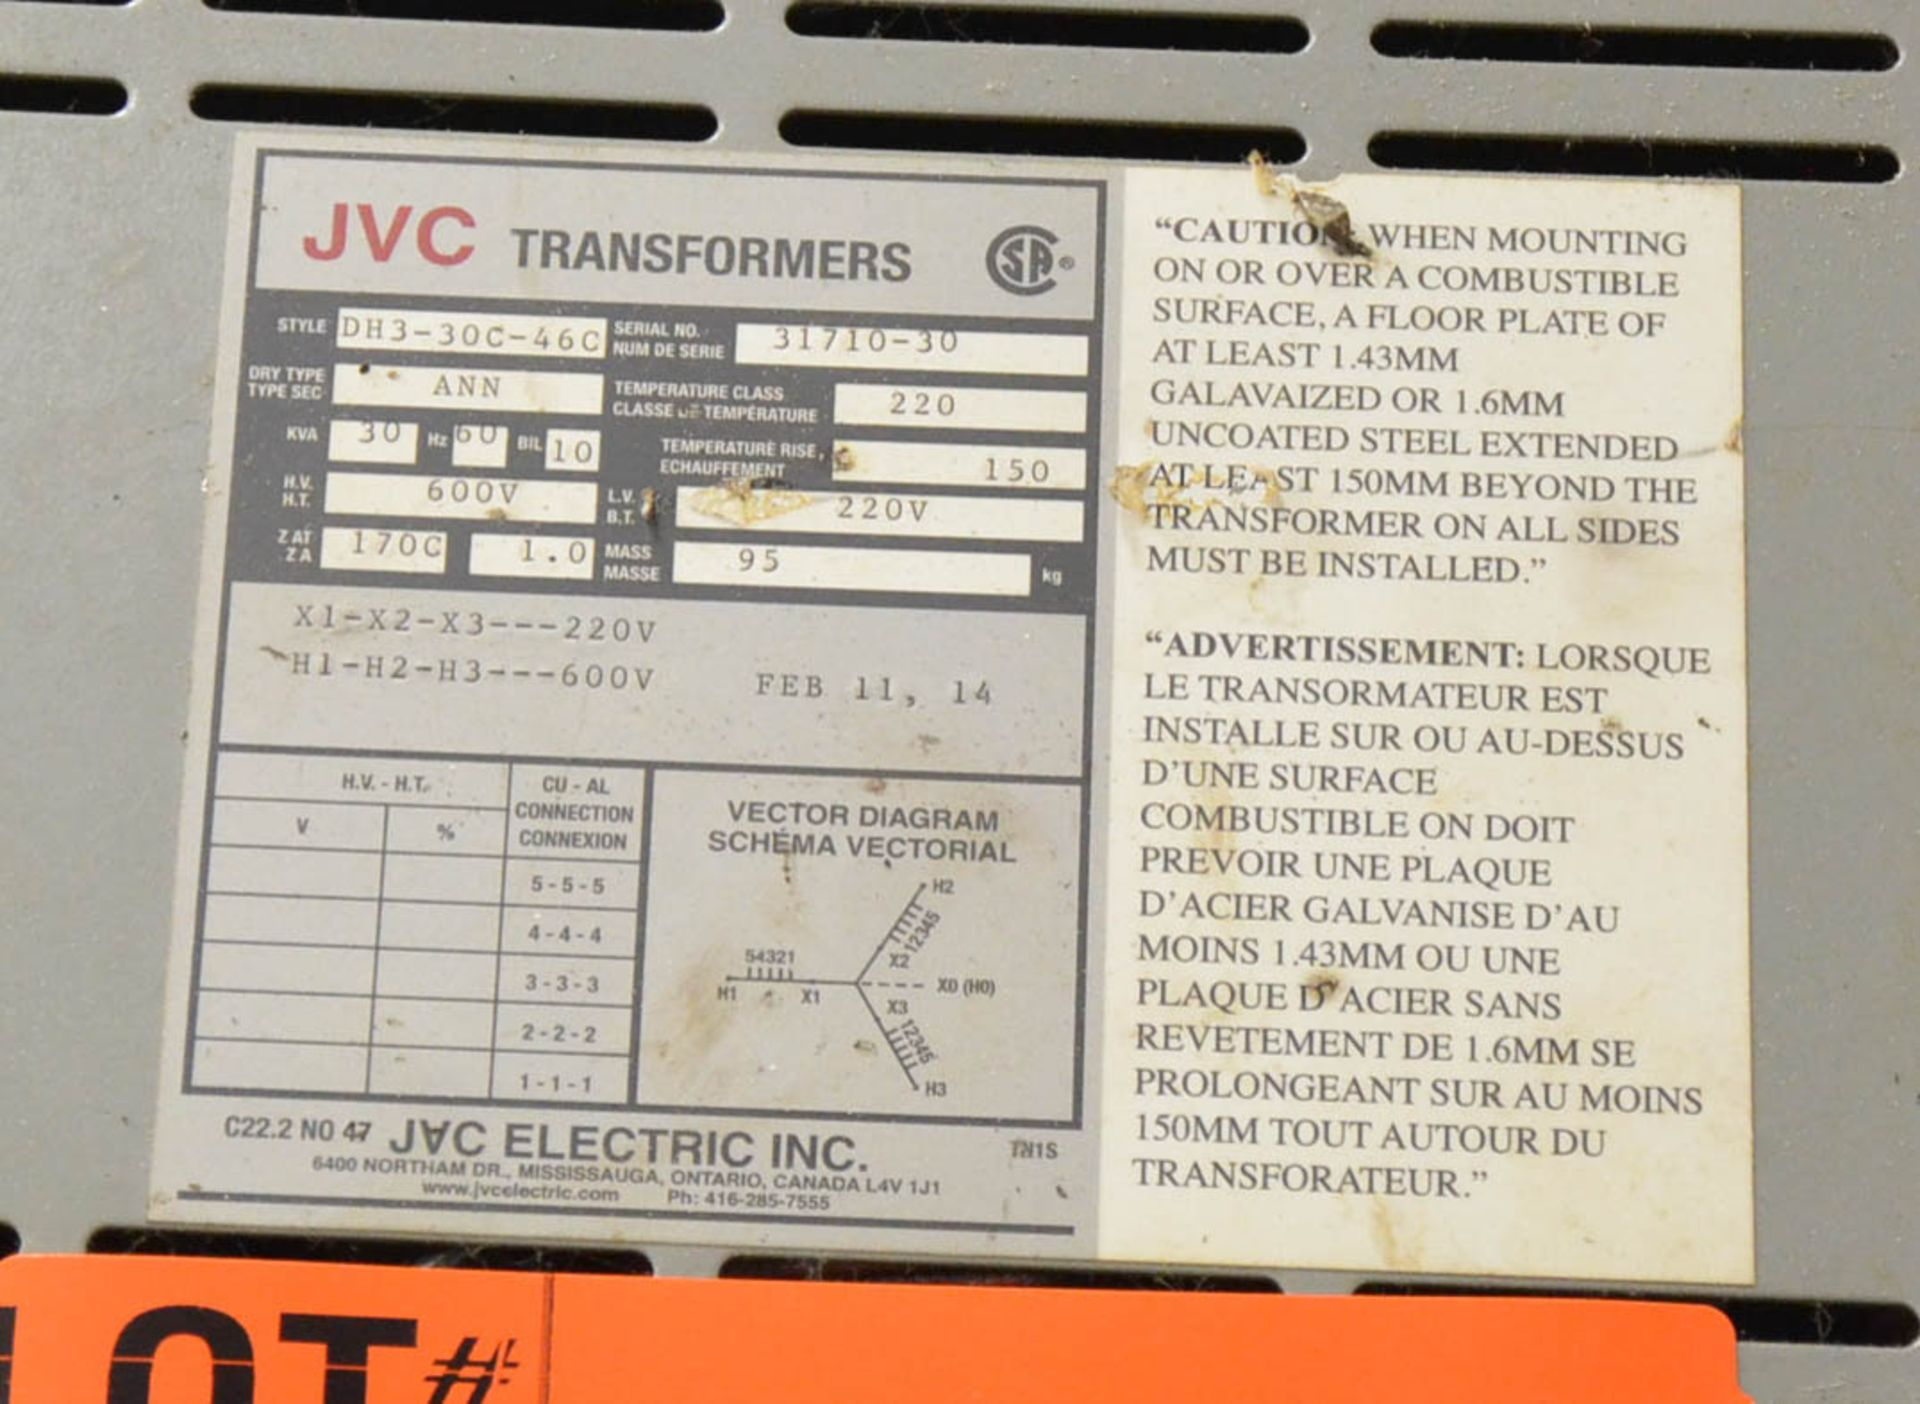 JVC 30KVA/600-220V/3PH/60HZ TRANSFORMER (CI) [RIGGING FEES FOR LOT #39 - $50 USD PLUS APPLICABLE - Image 2 of 2